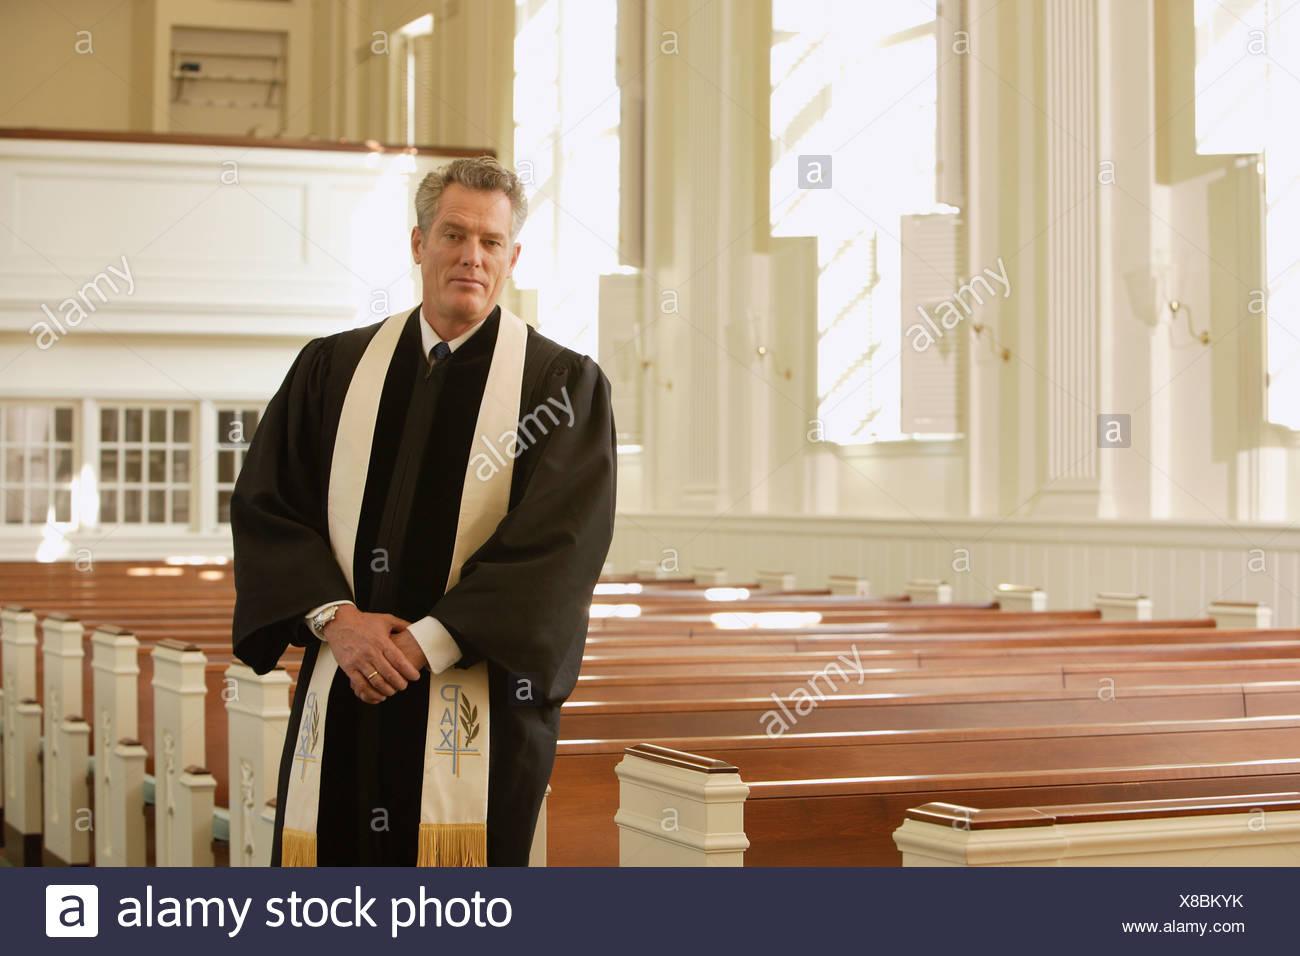 Priest standing next to pews Stock Photo